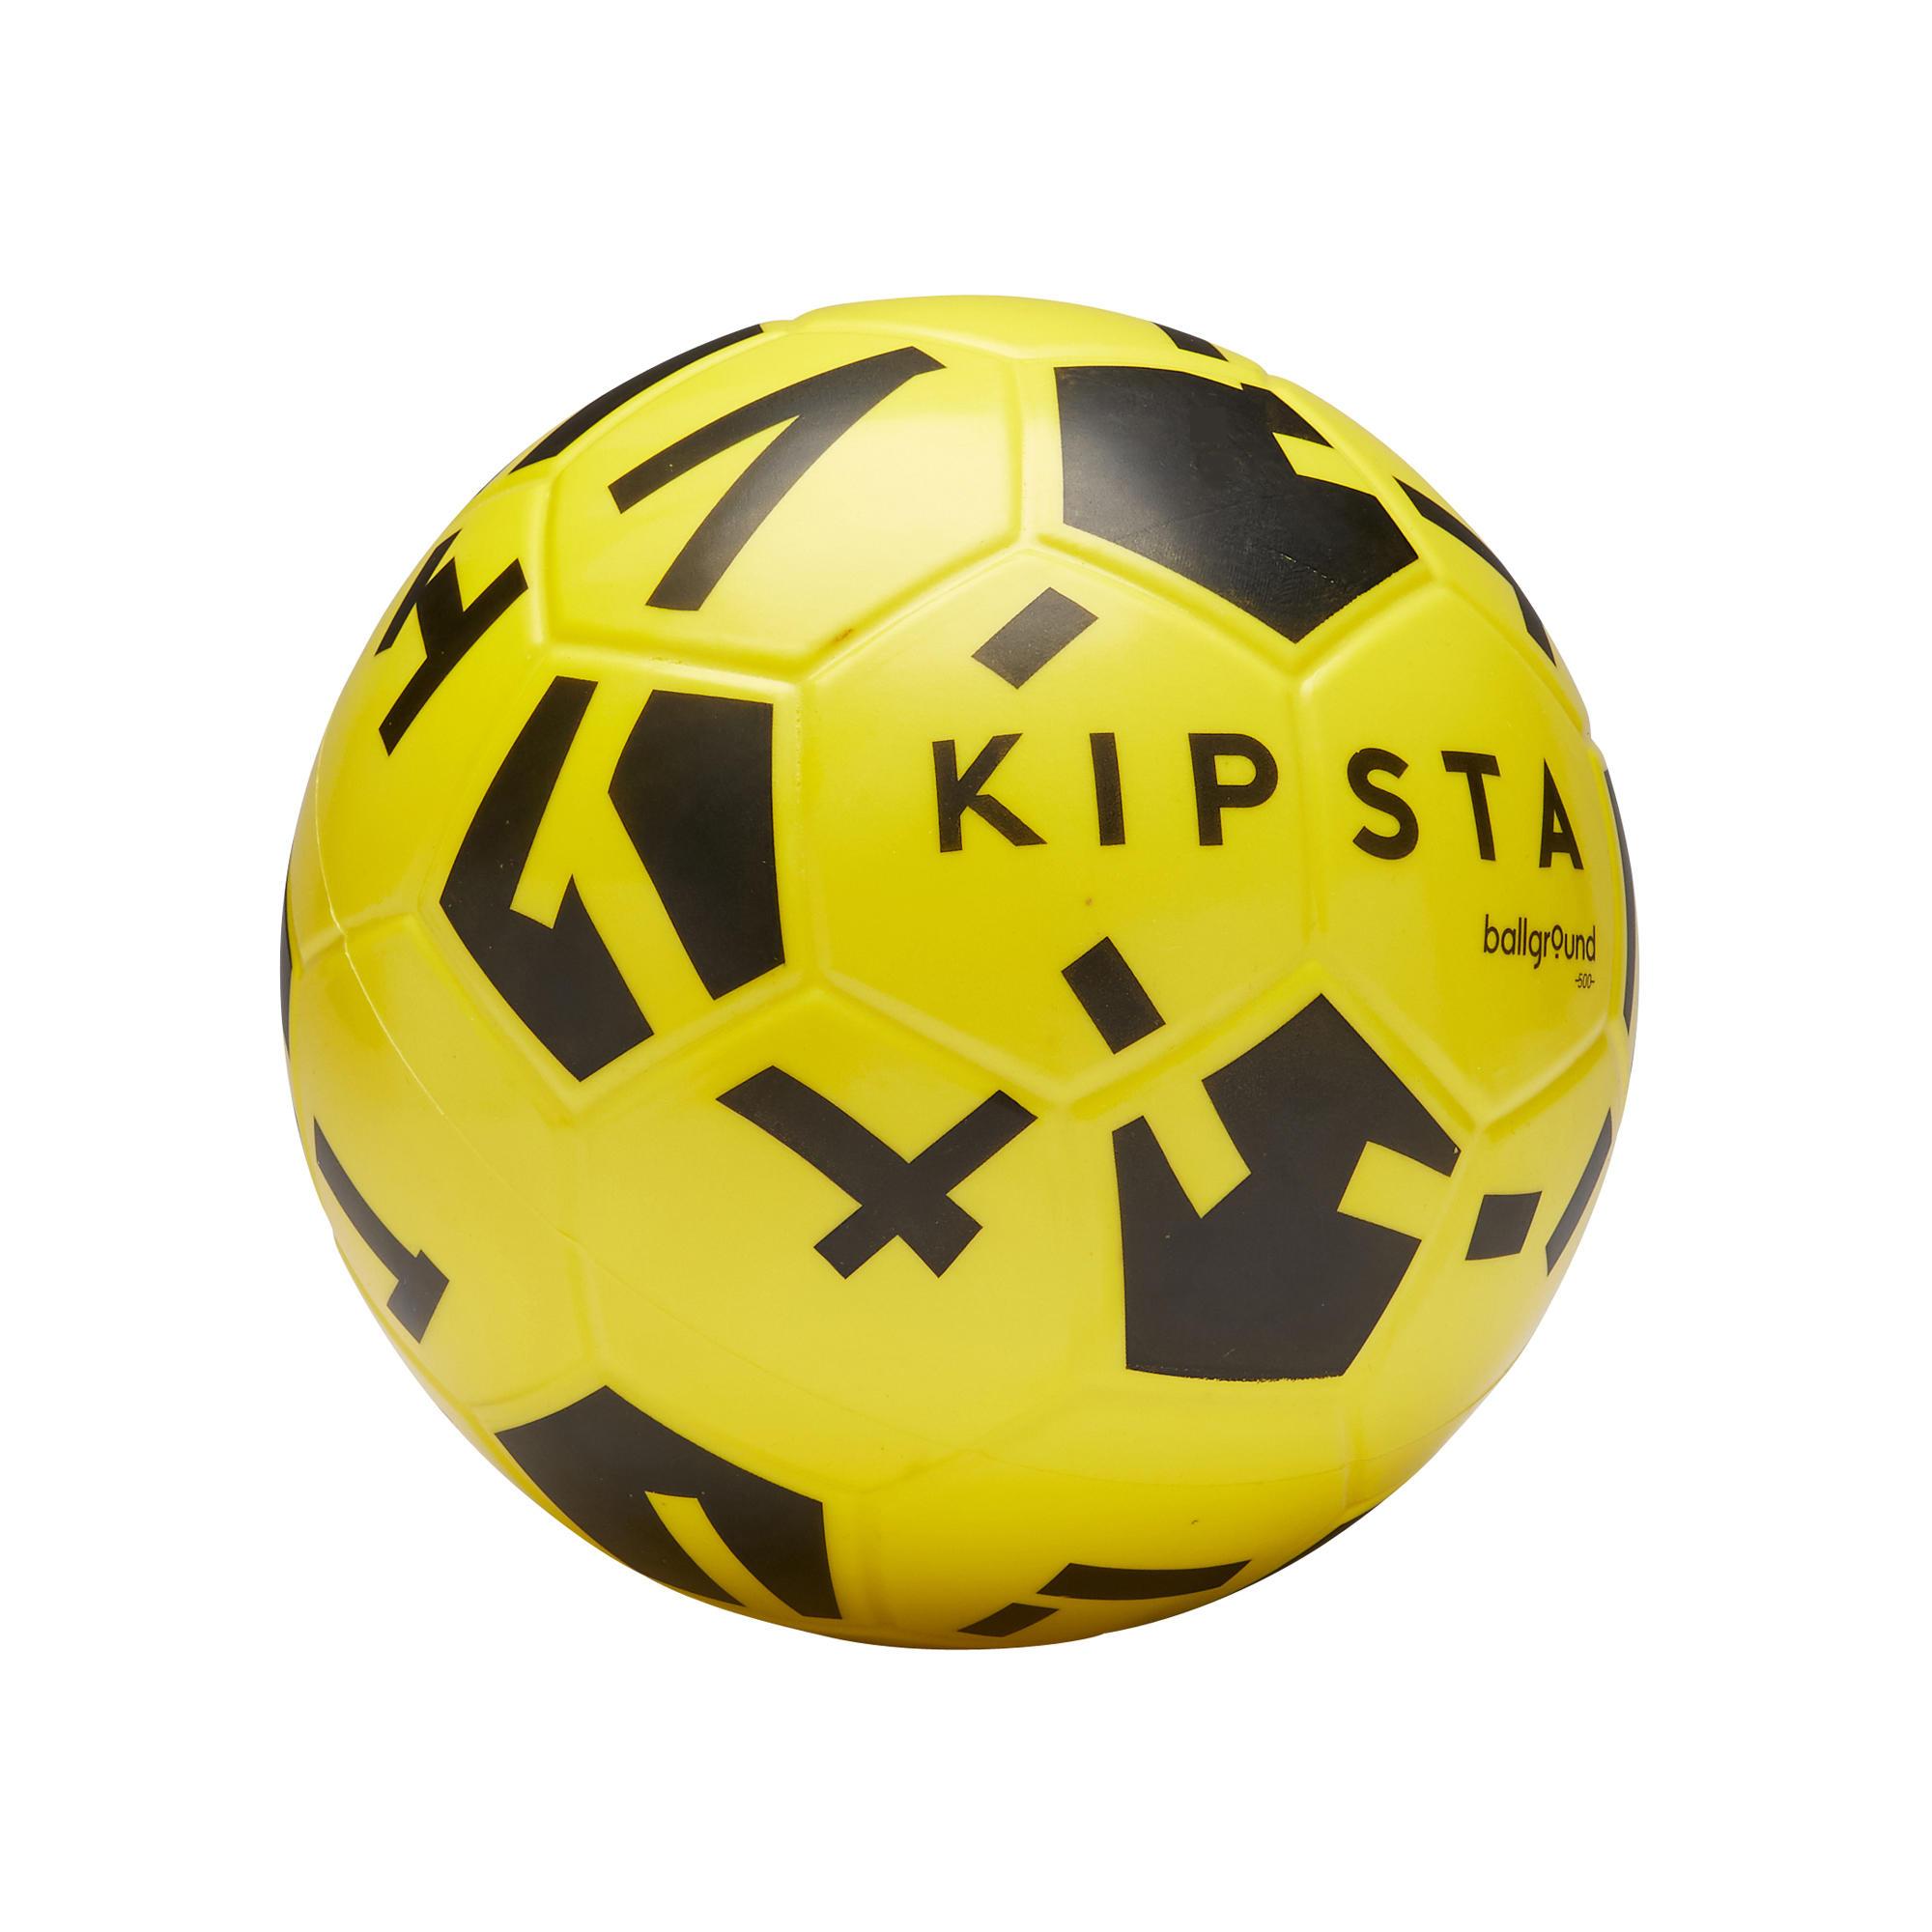 Duokon Ballon de Football Taille 2 de Ballon de Football de Football de Sport de Plein air denfants pour l/équipement de Sport dexercice des Tout-Petits Blanc